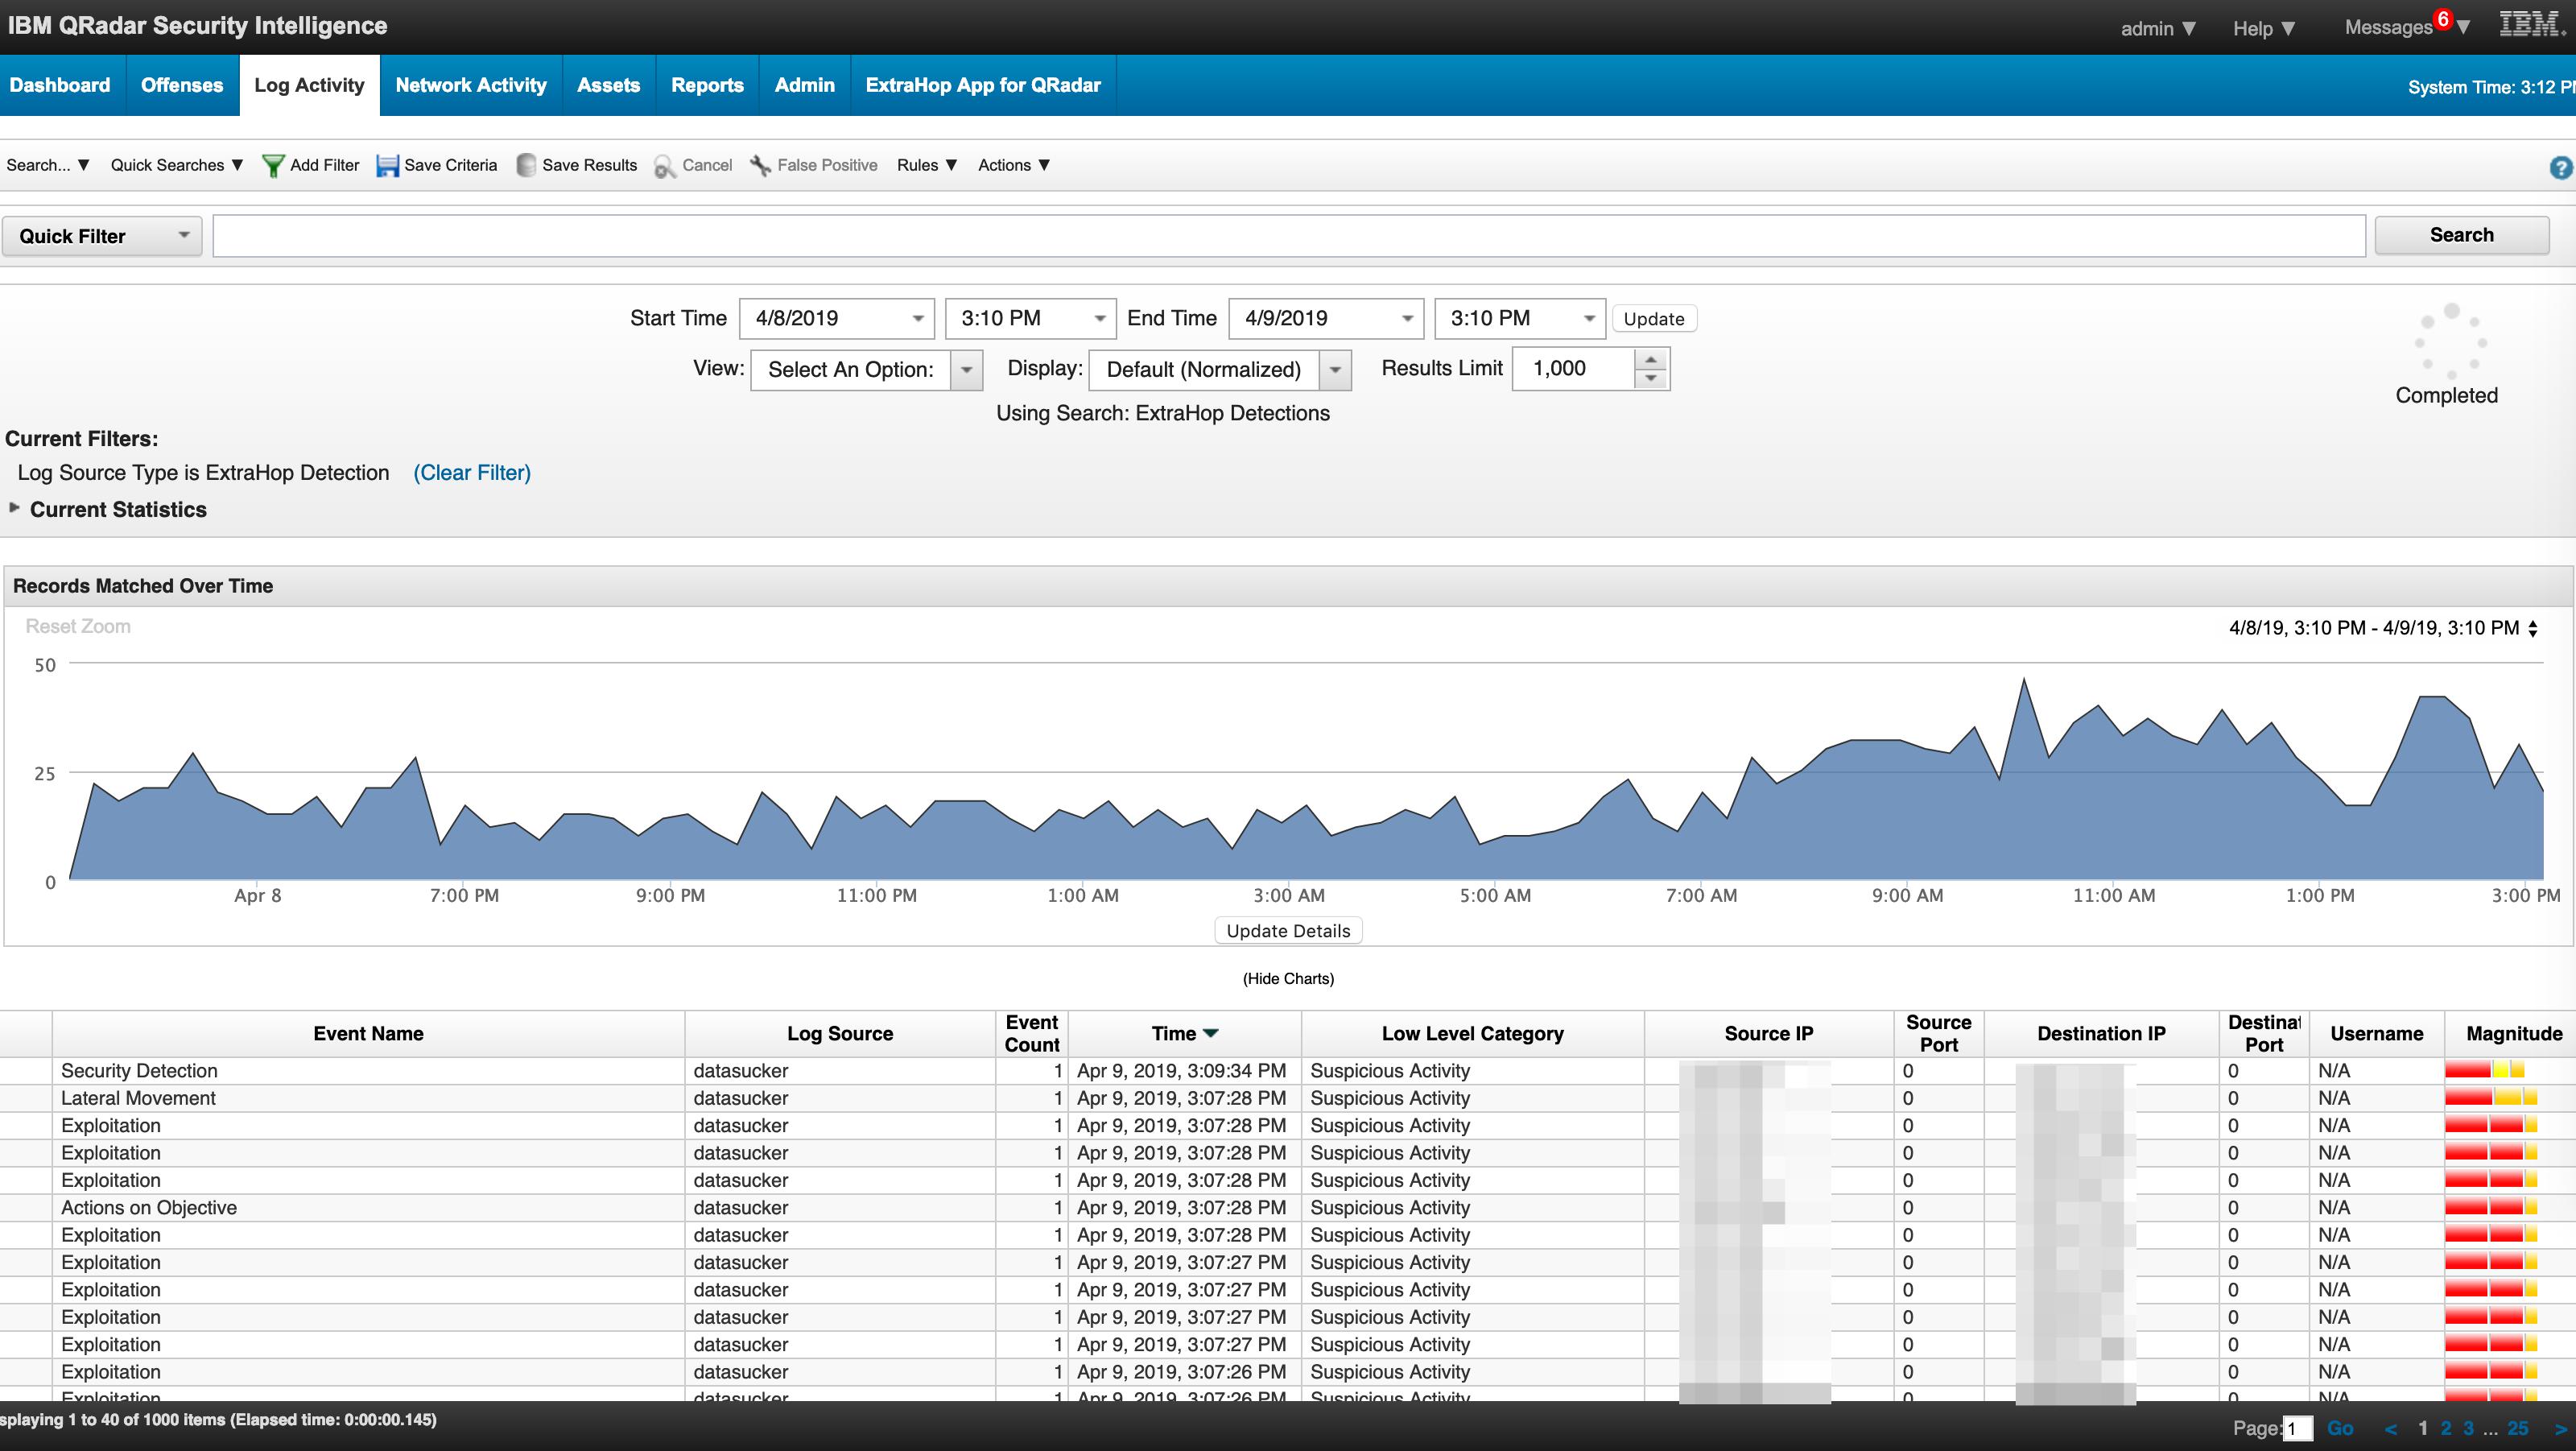 ExtraHop tab in IBM QRadar